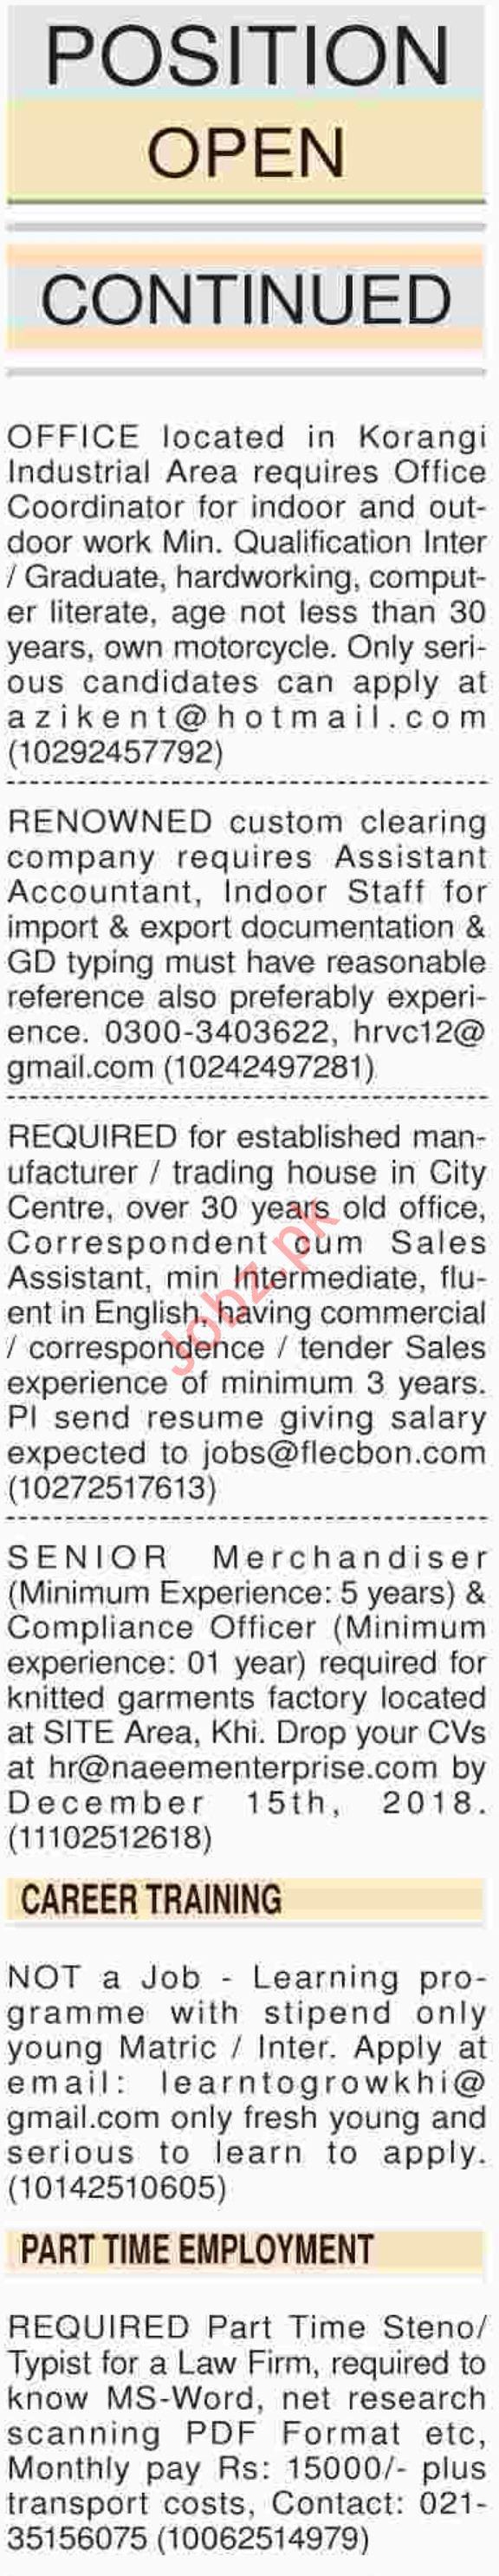 Dawn Newspaper Sunday General Classified Ads 9/12/2018